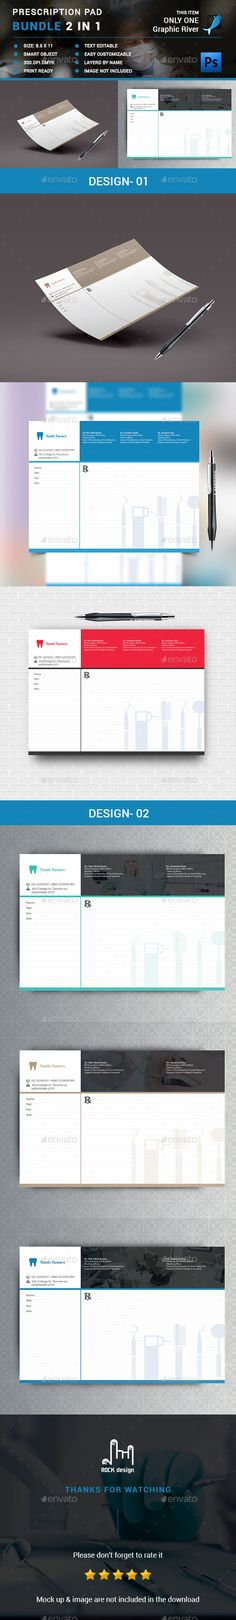 perscription pad template